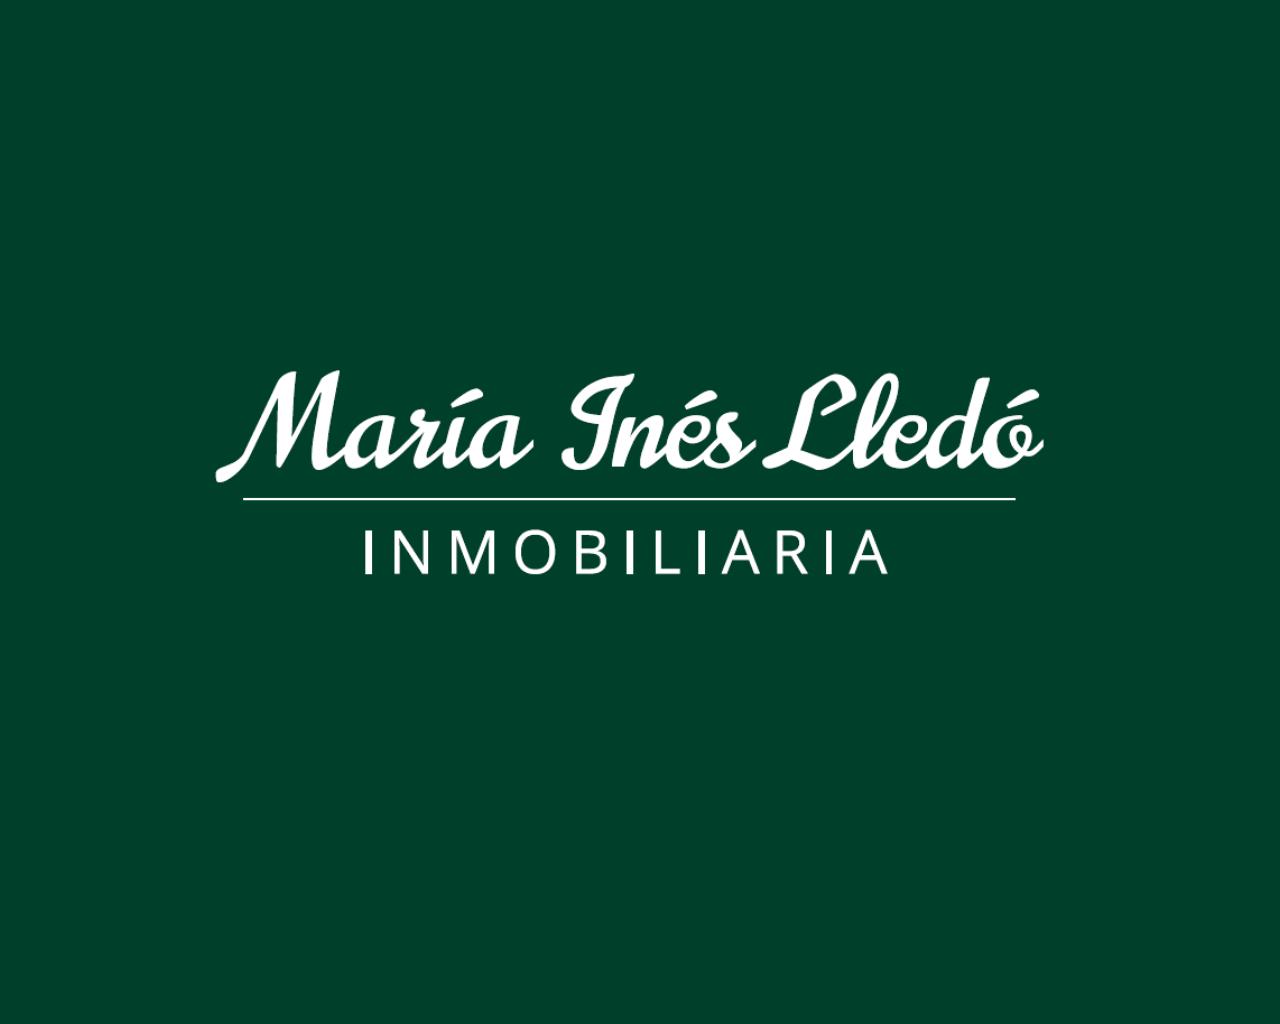 Maria Inés Lledó